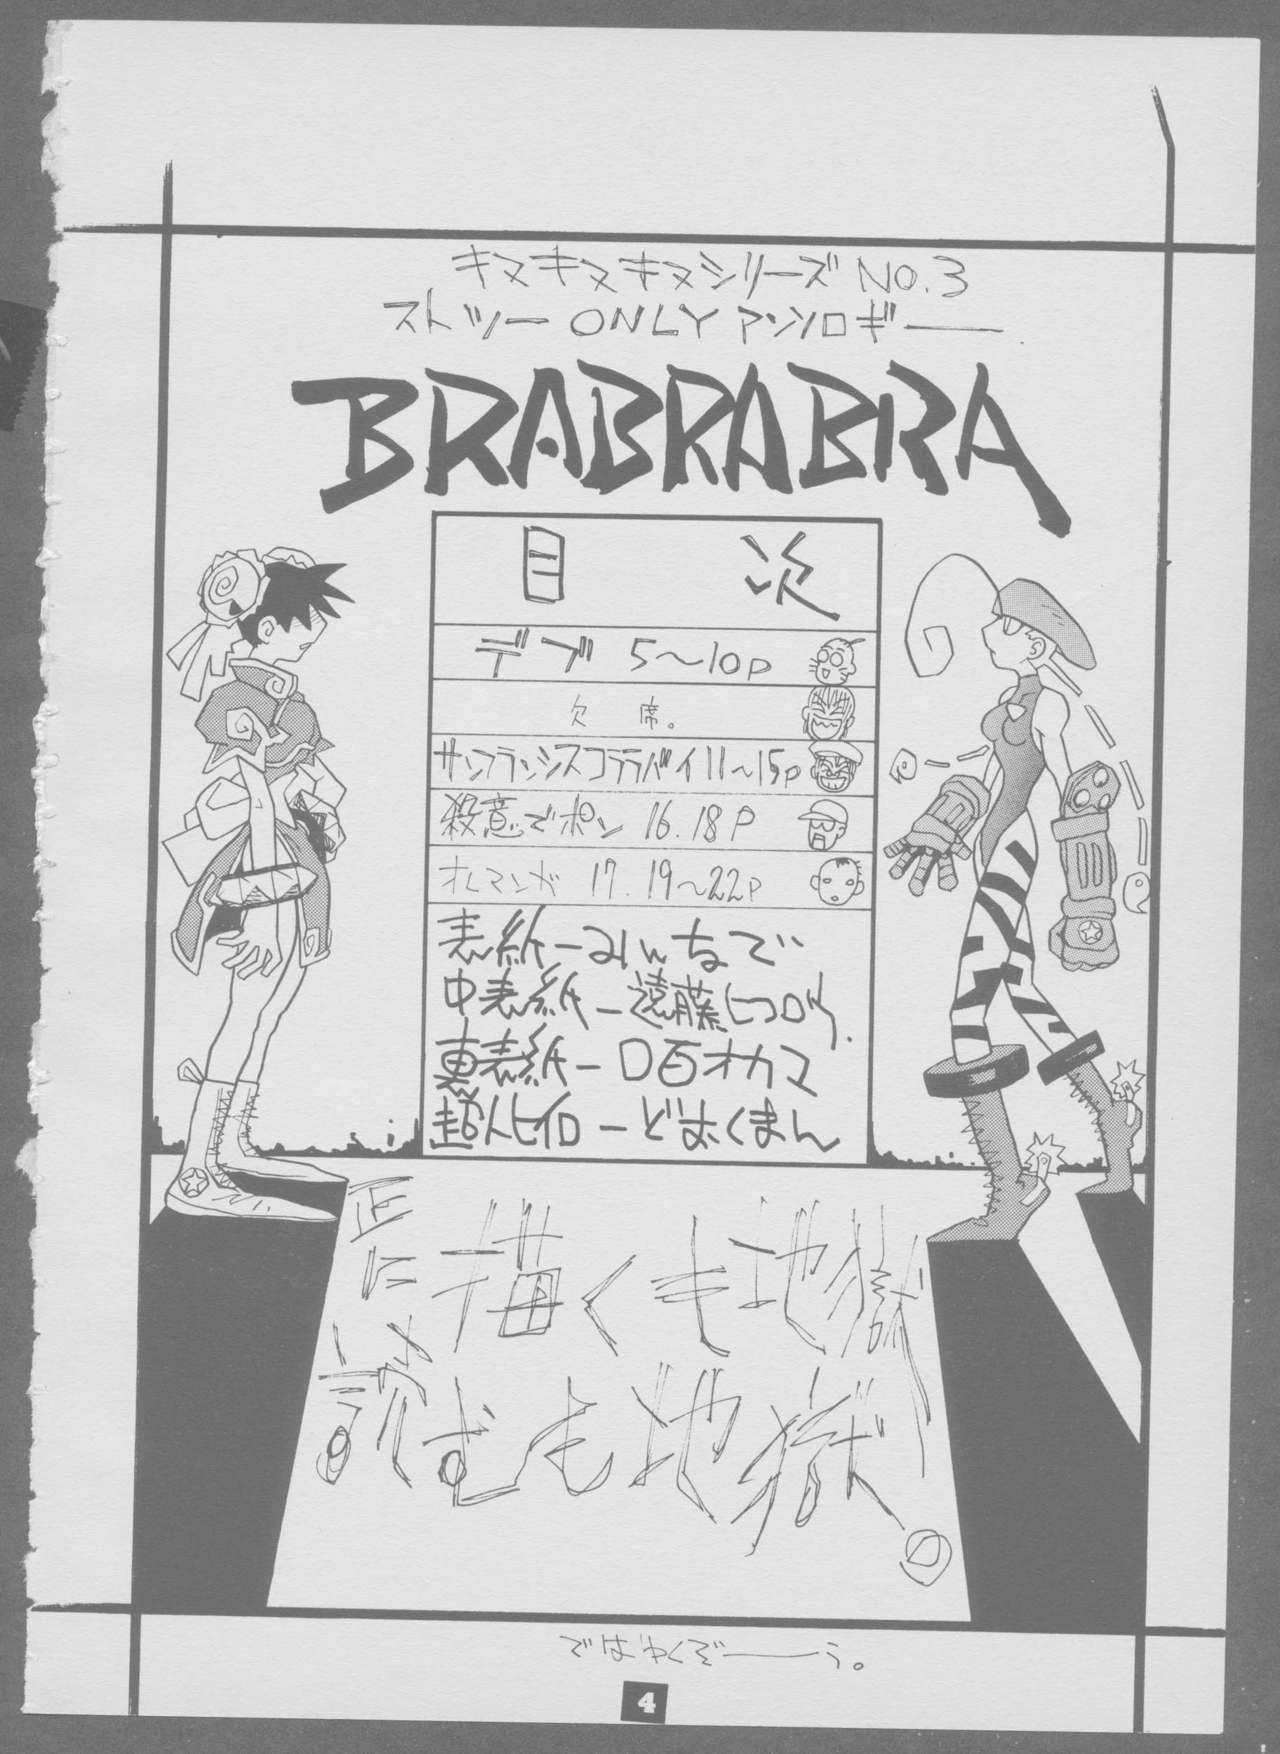 BraBraBra 2